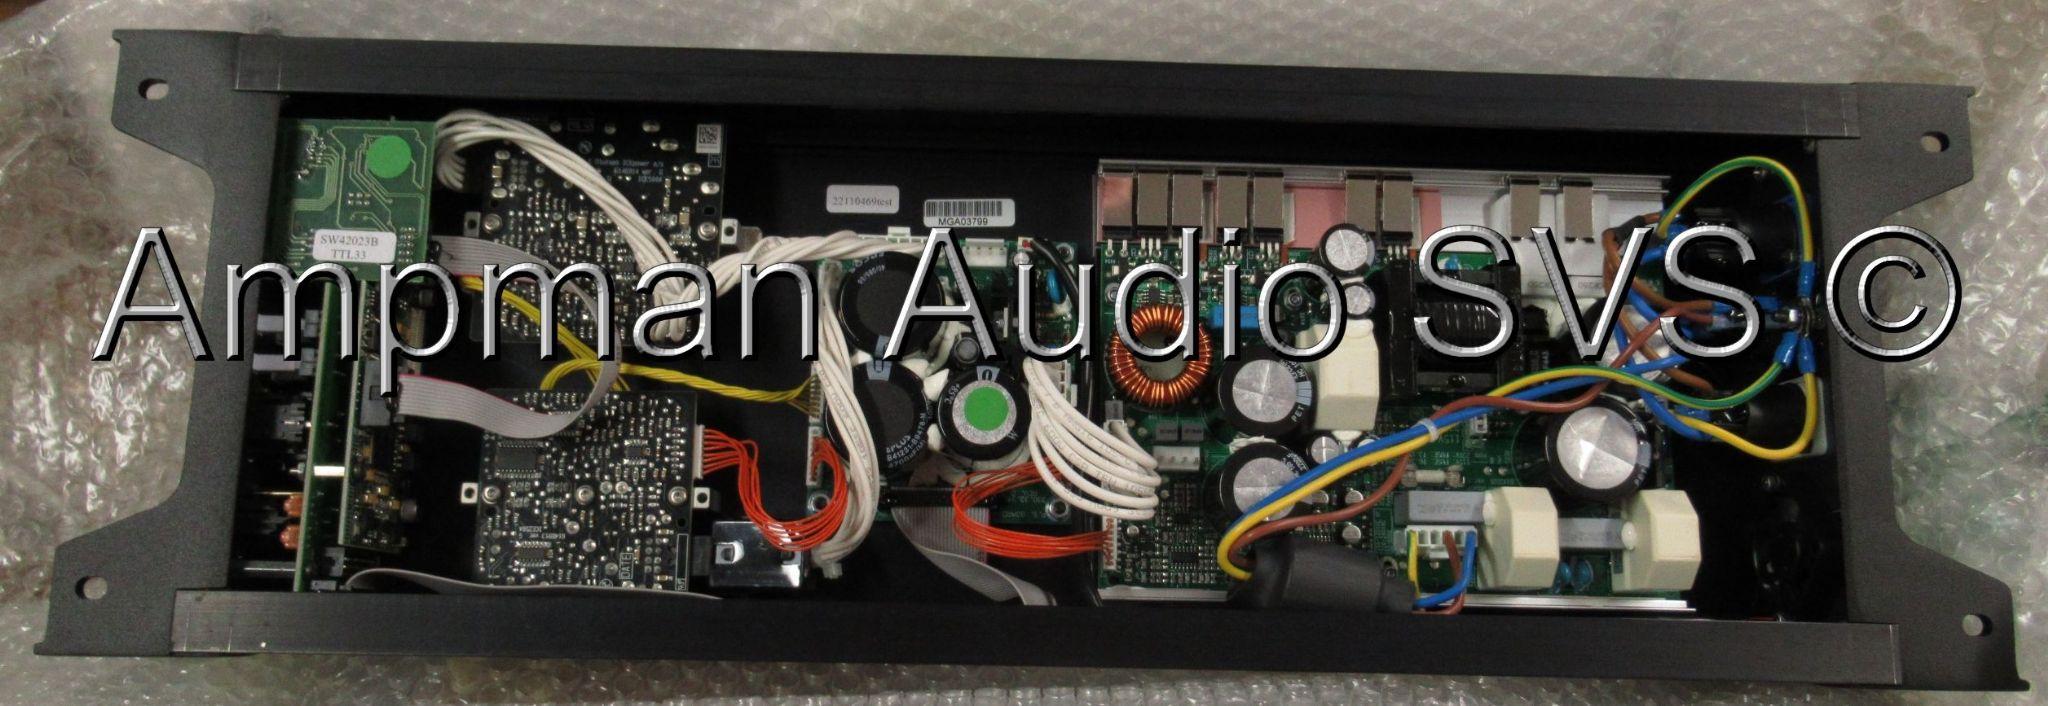 Rcf Ttl33a Ii Amplifier Assembly 230v Ampman Audio